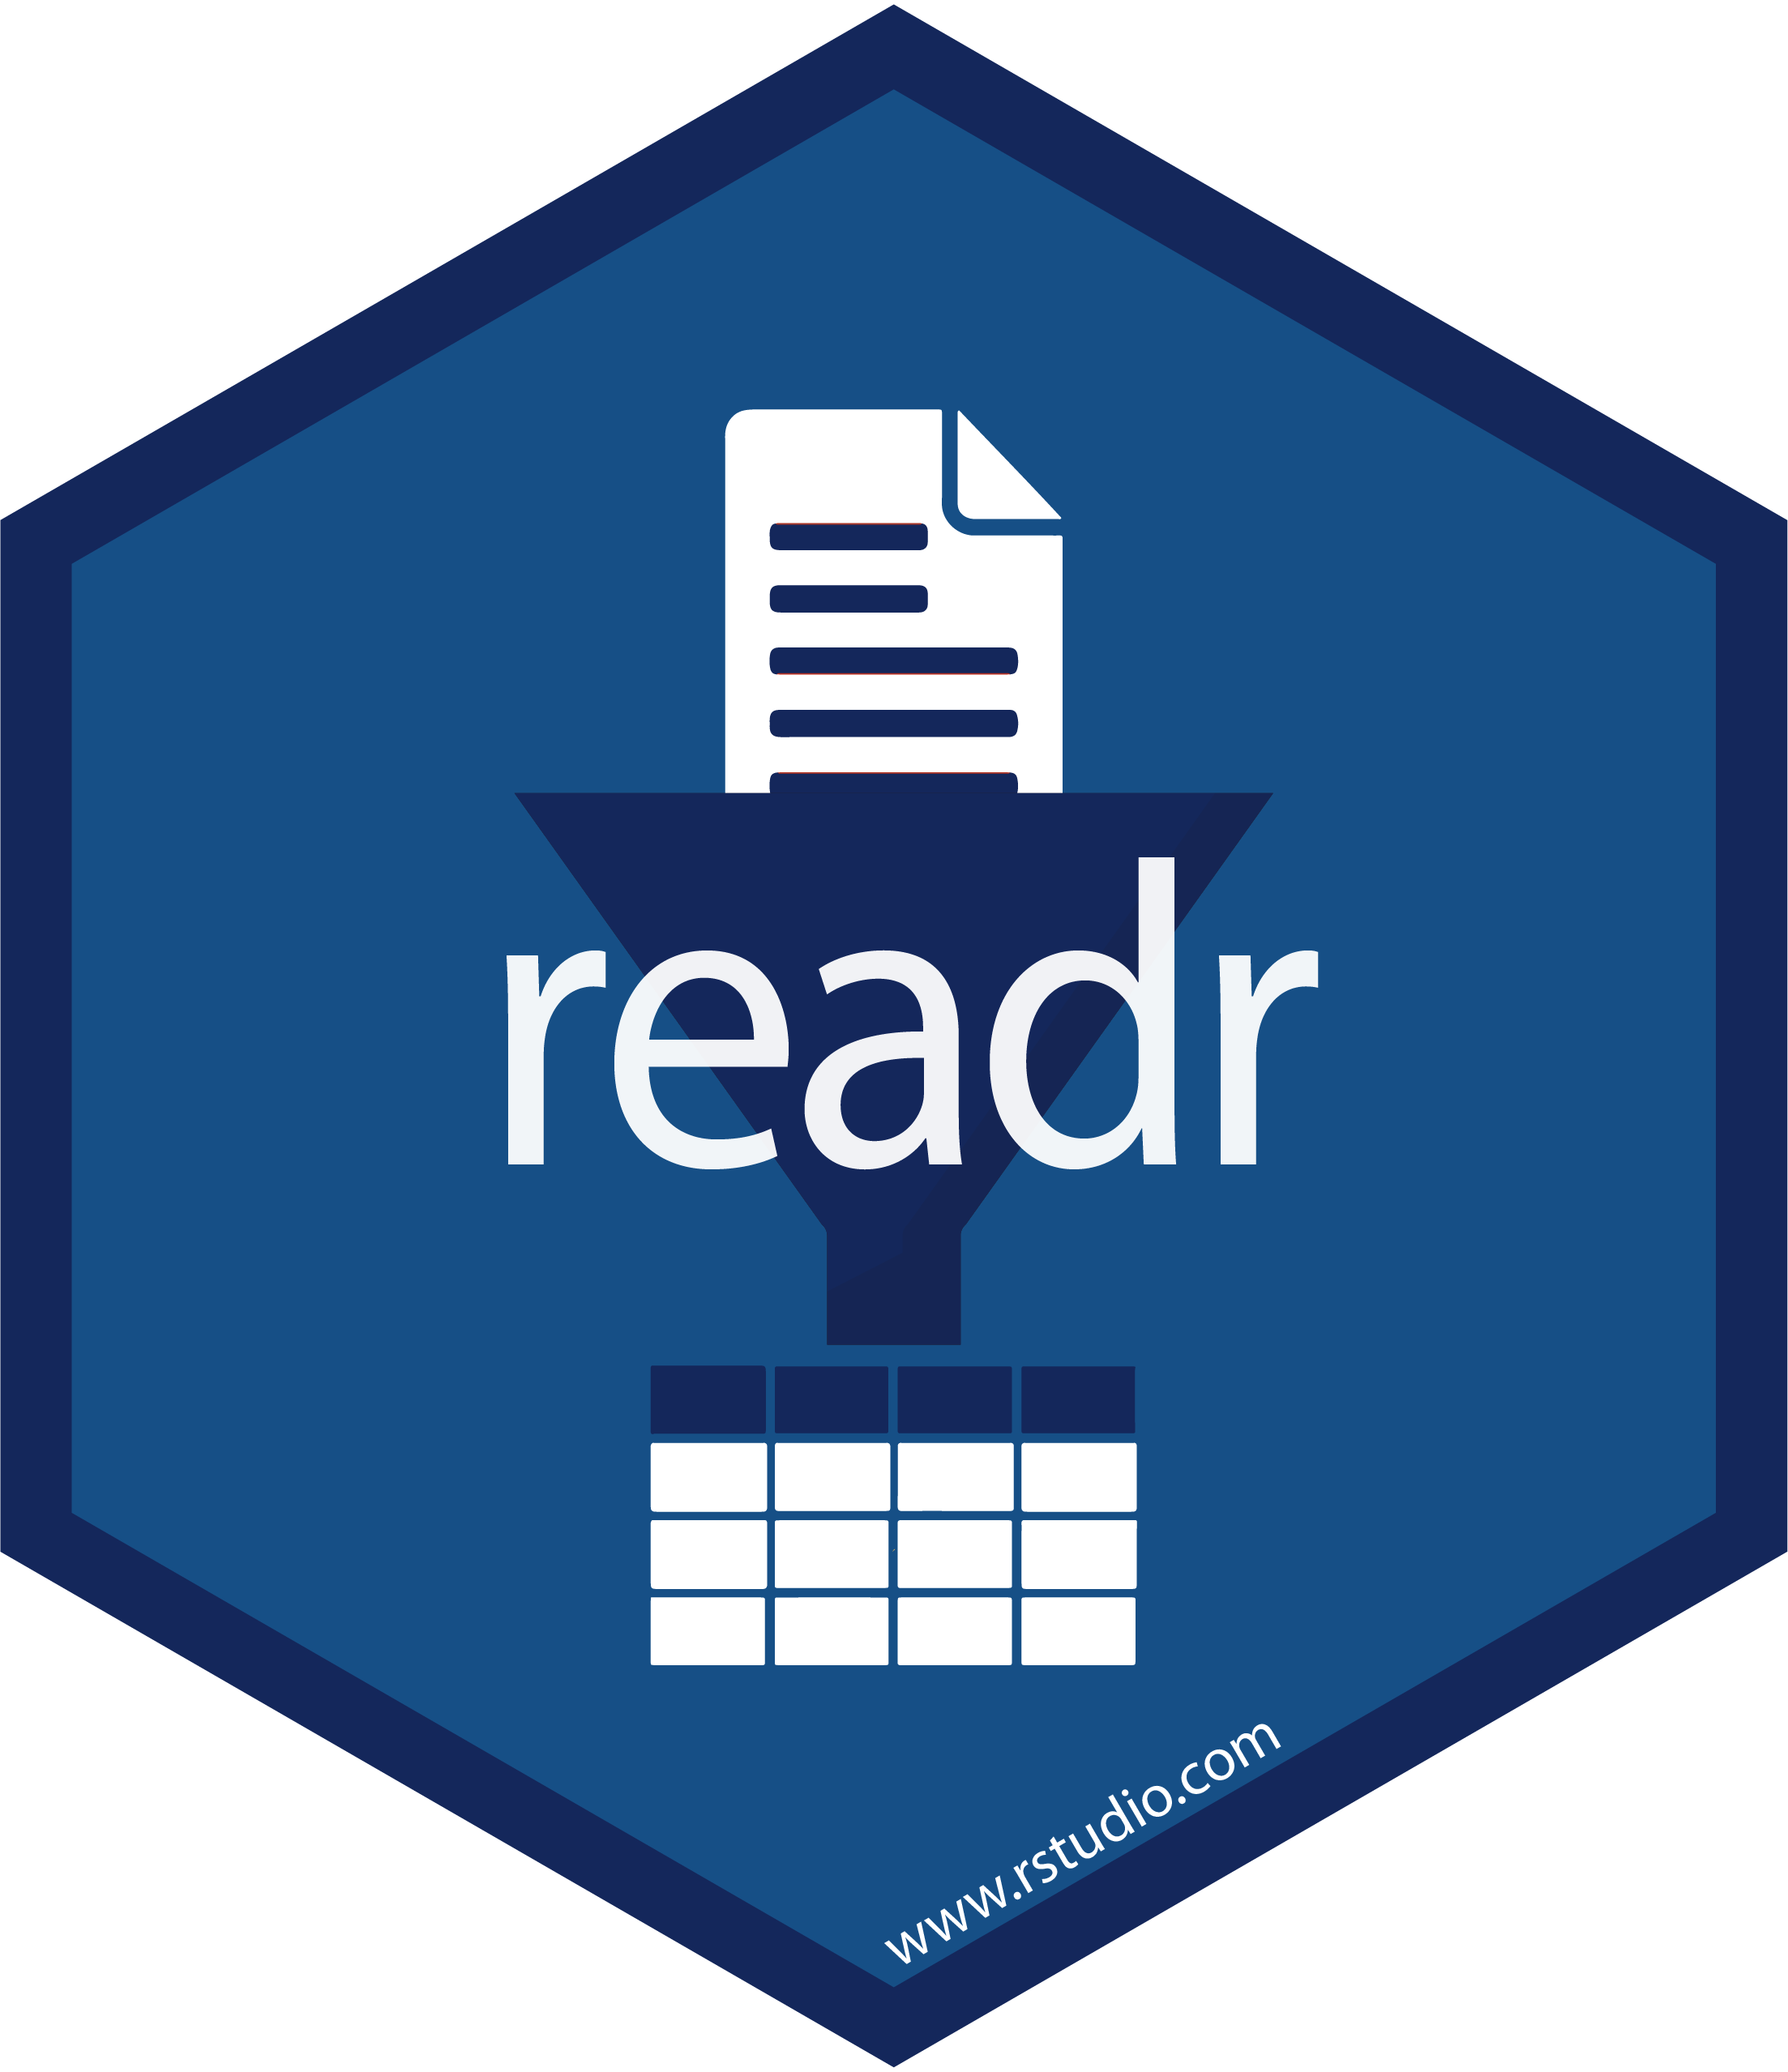 Master the Tidyverse 4: readr